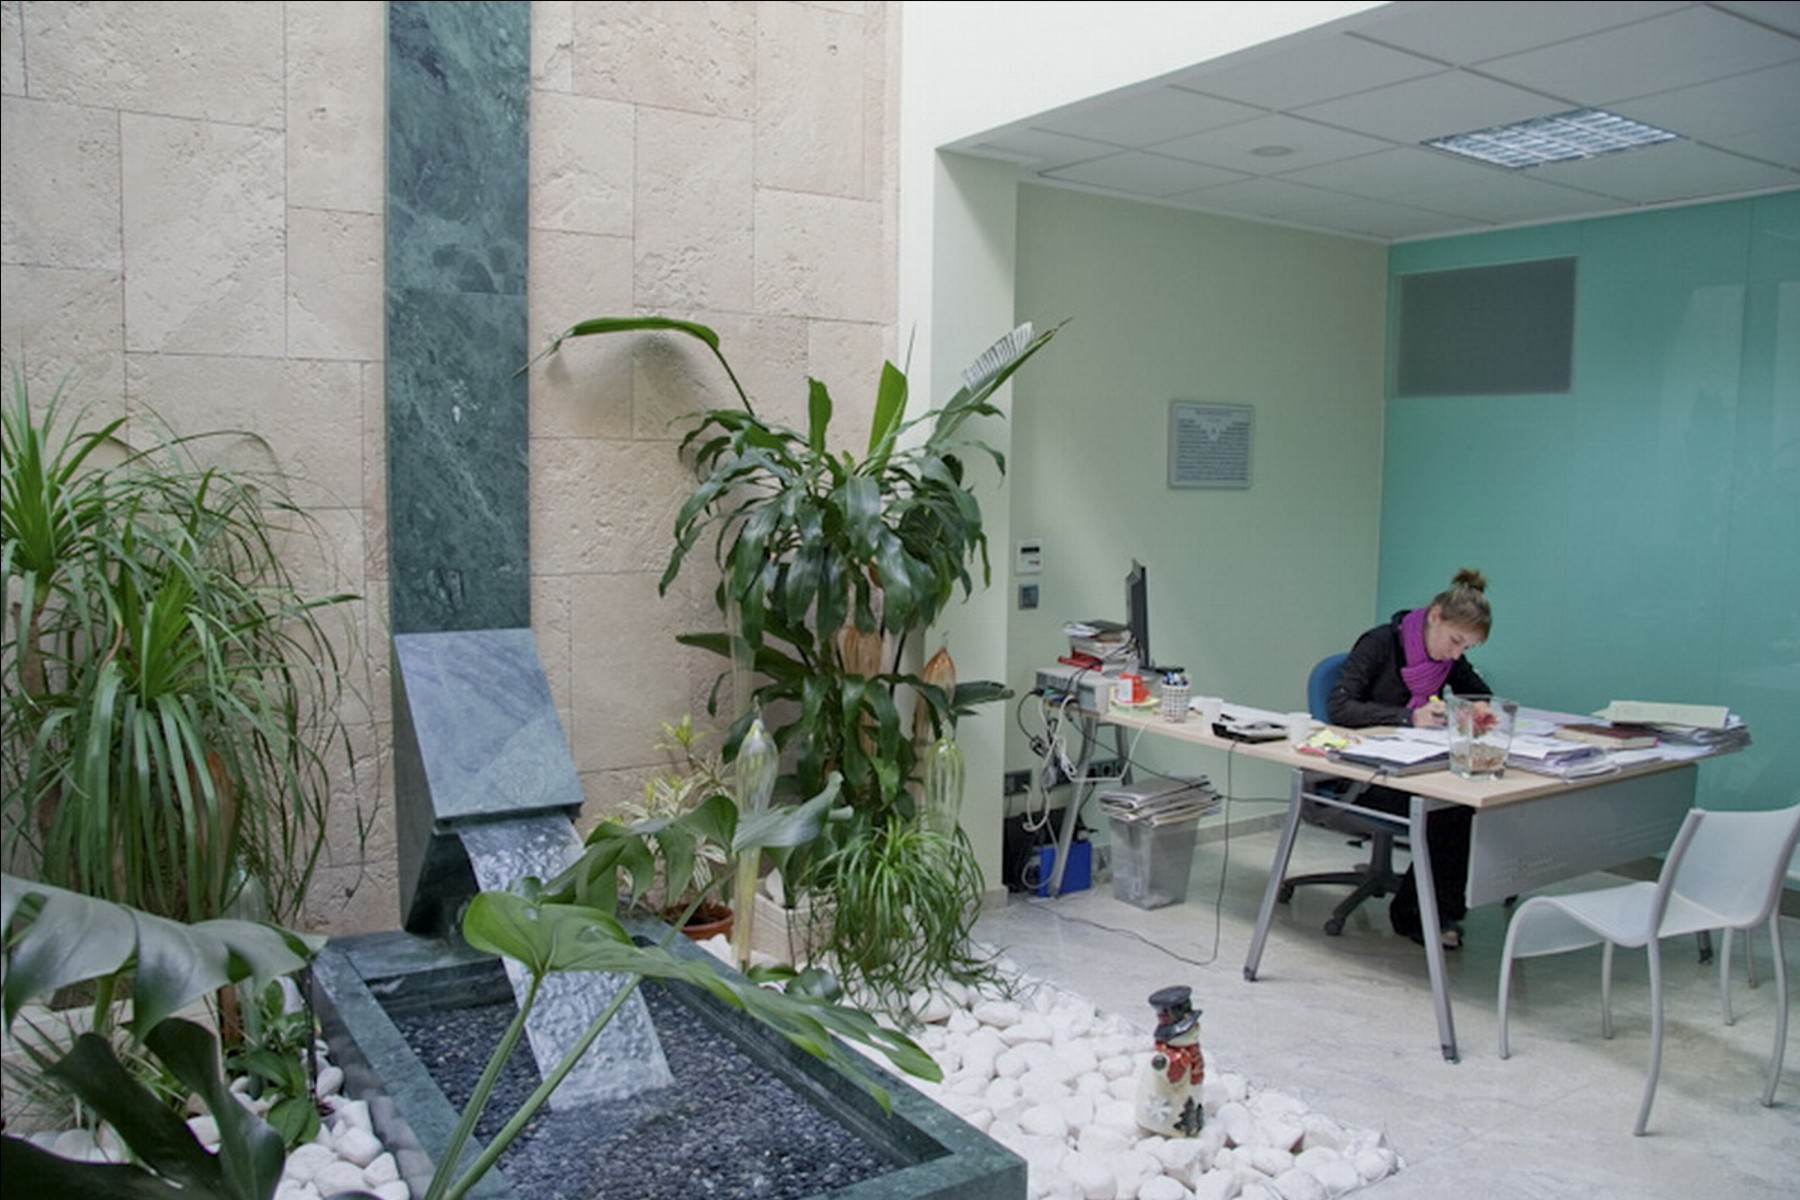 Imaginarq-049-Reforma-oficina-Pego-Alicante-14A